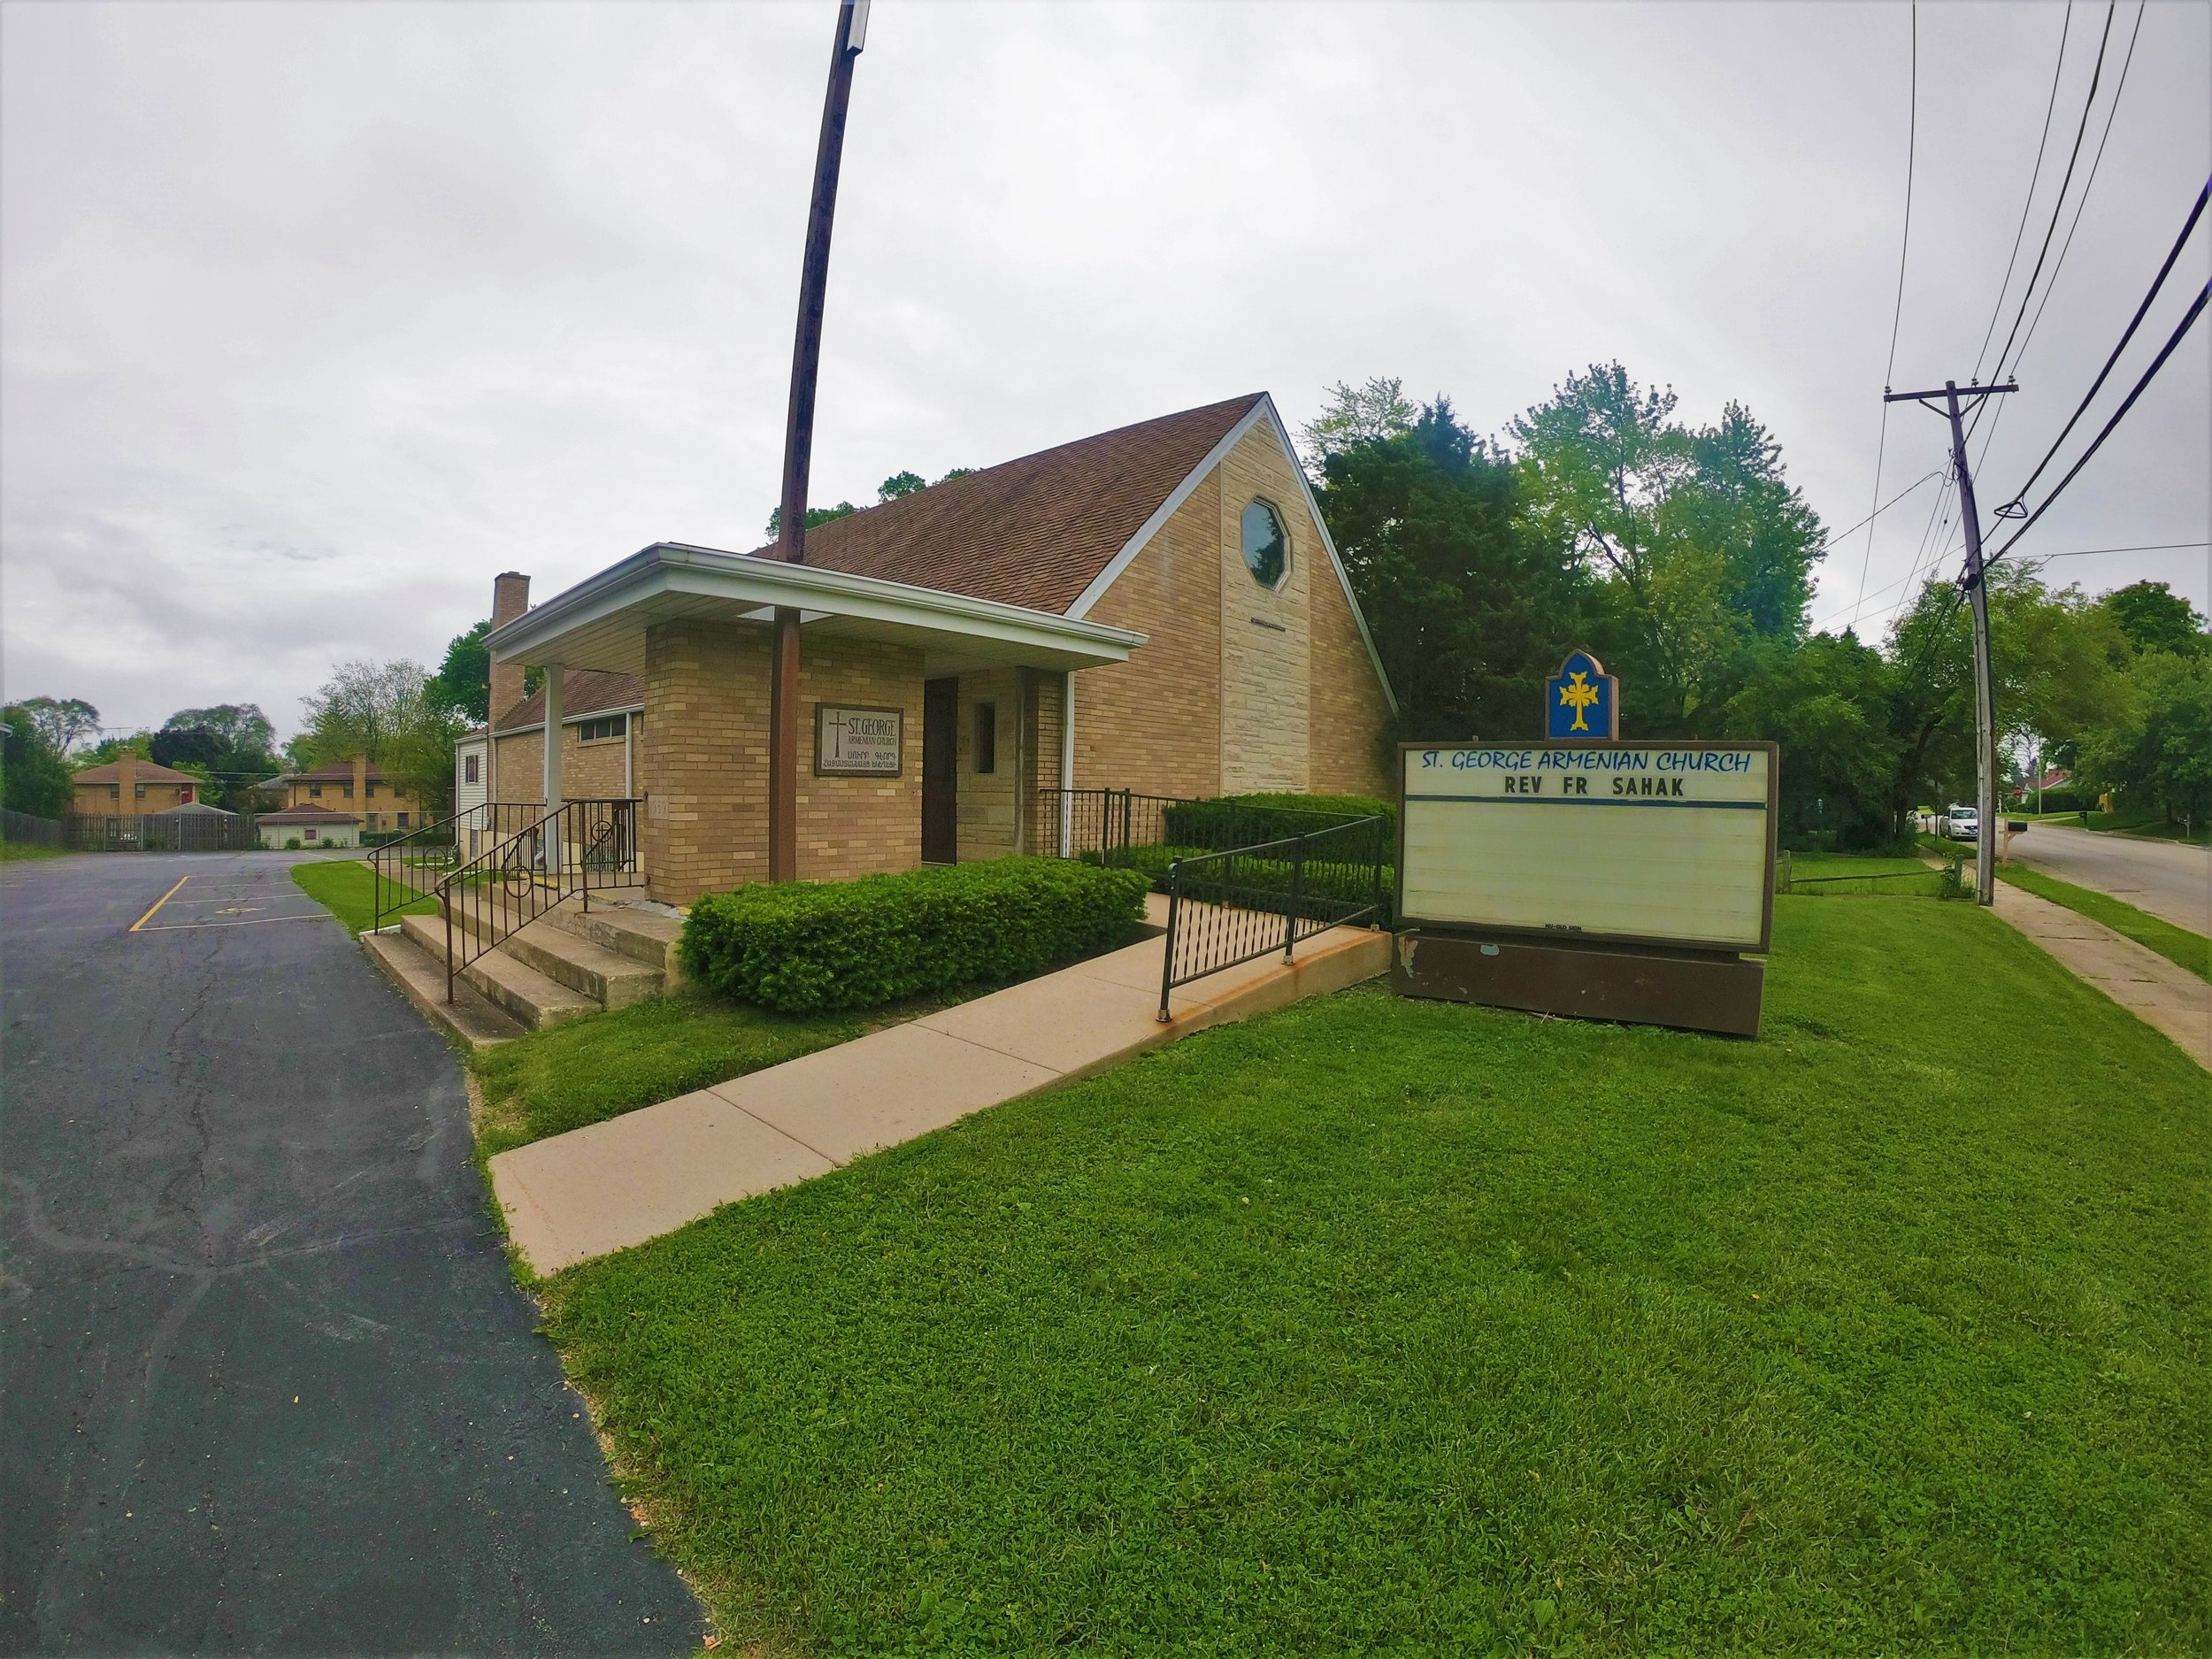 St. George Armenian Apostolic Church in Waukegan, Illinois